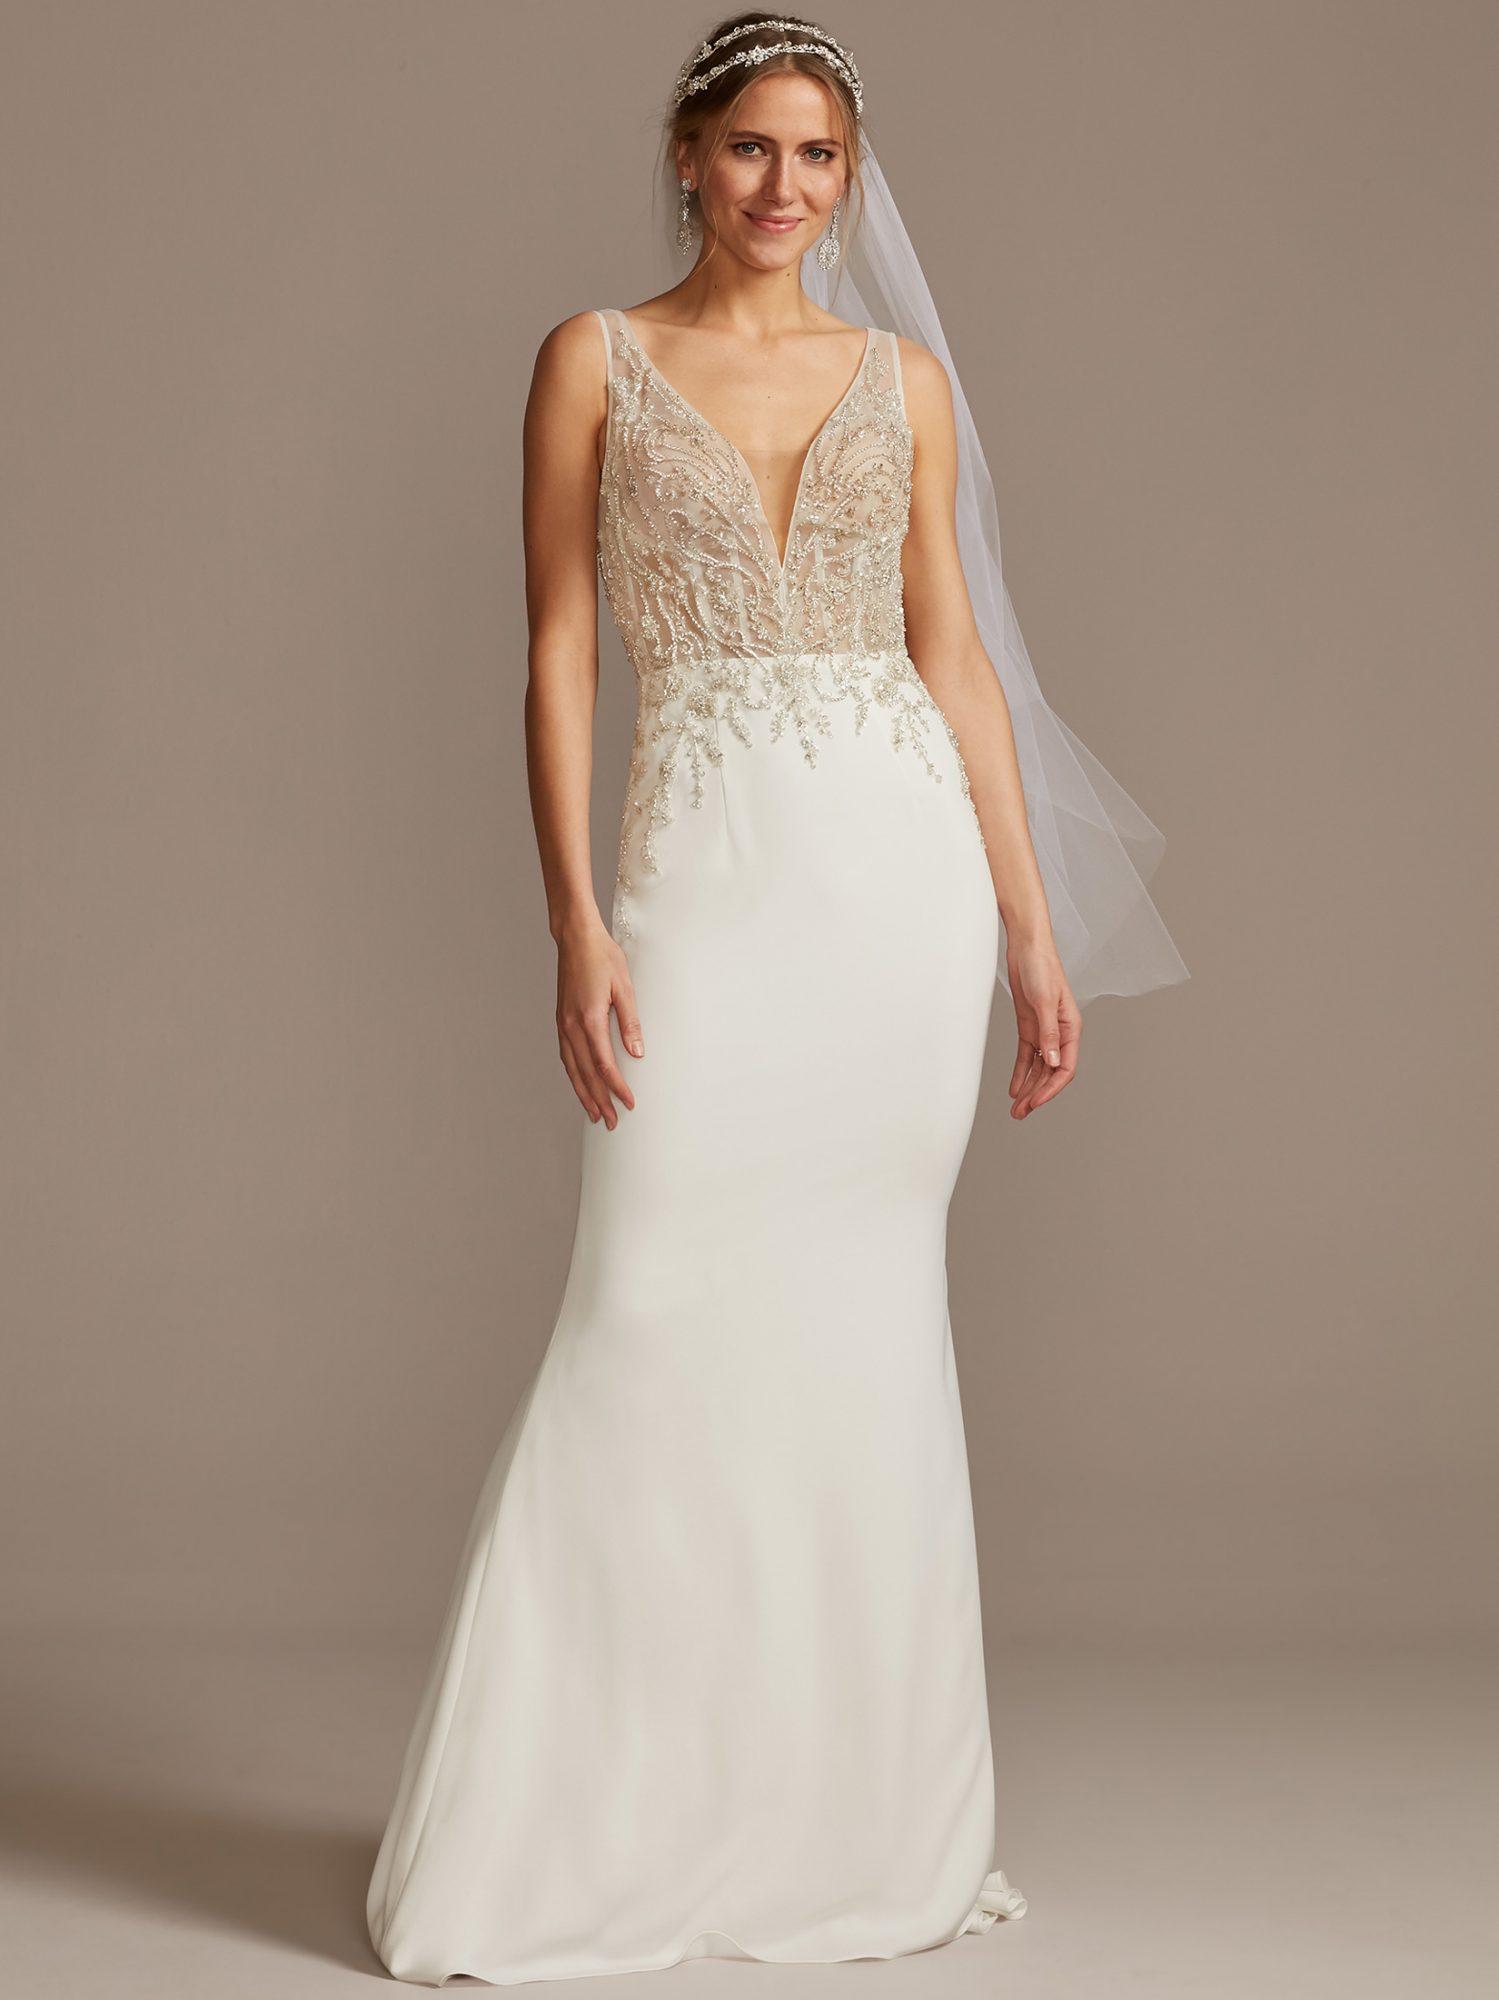 davids bridal deep v-neck corset bodice wedding dress spring 2021